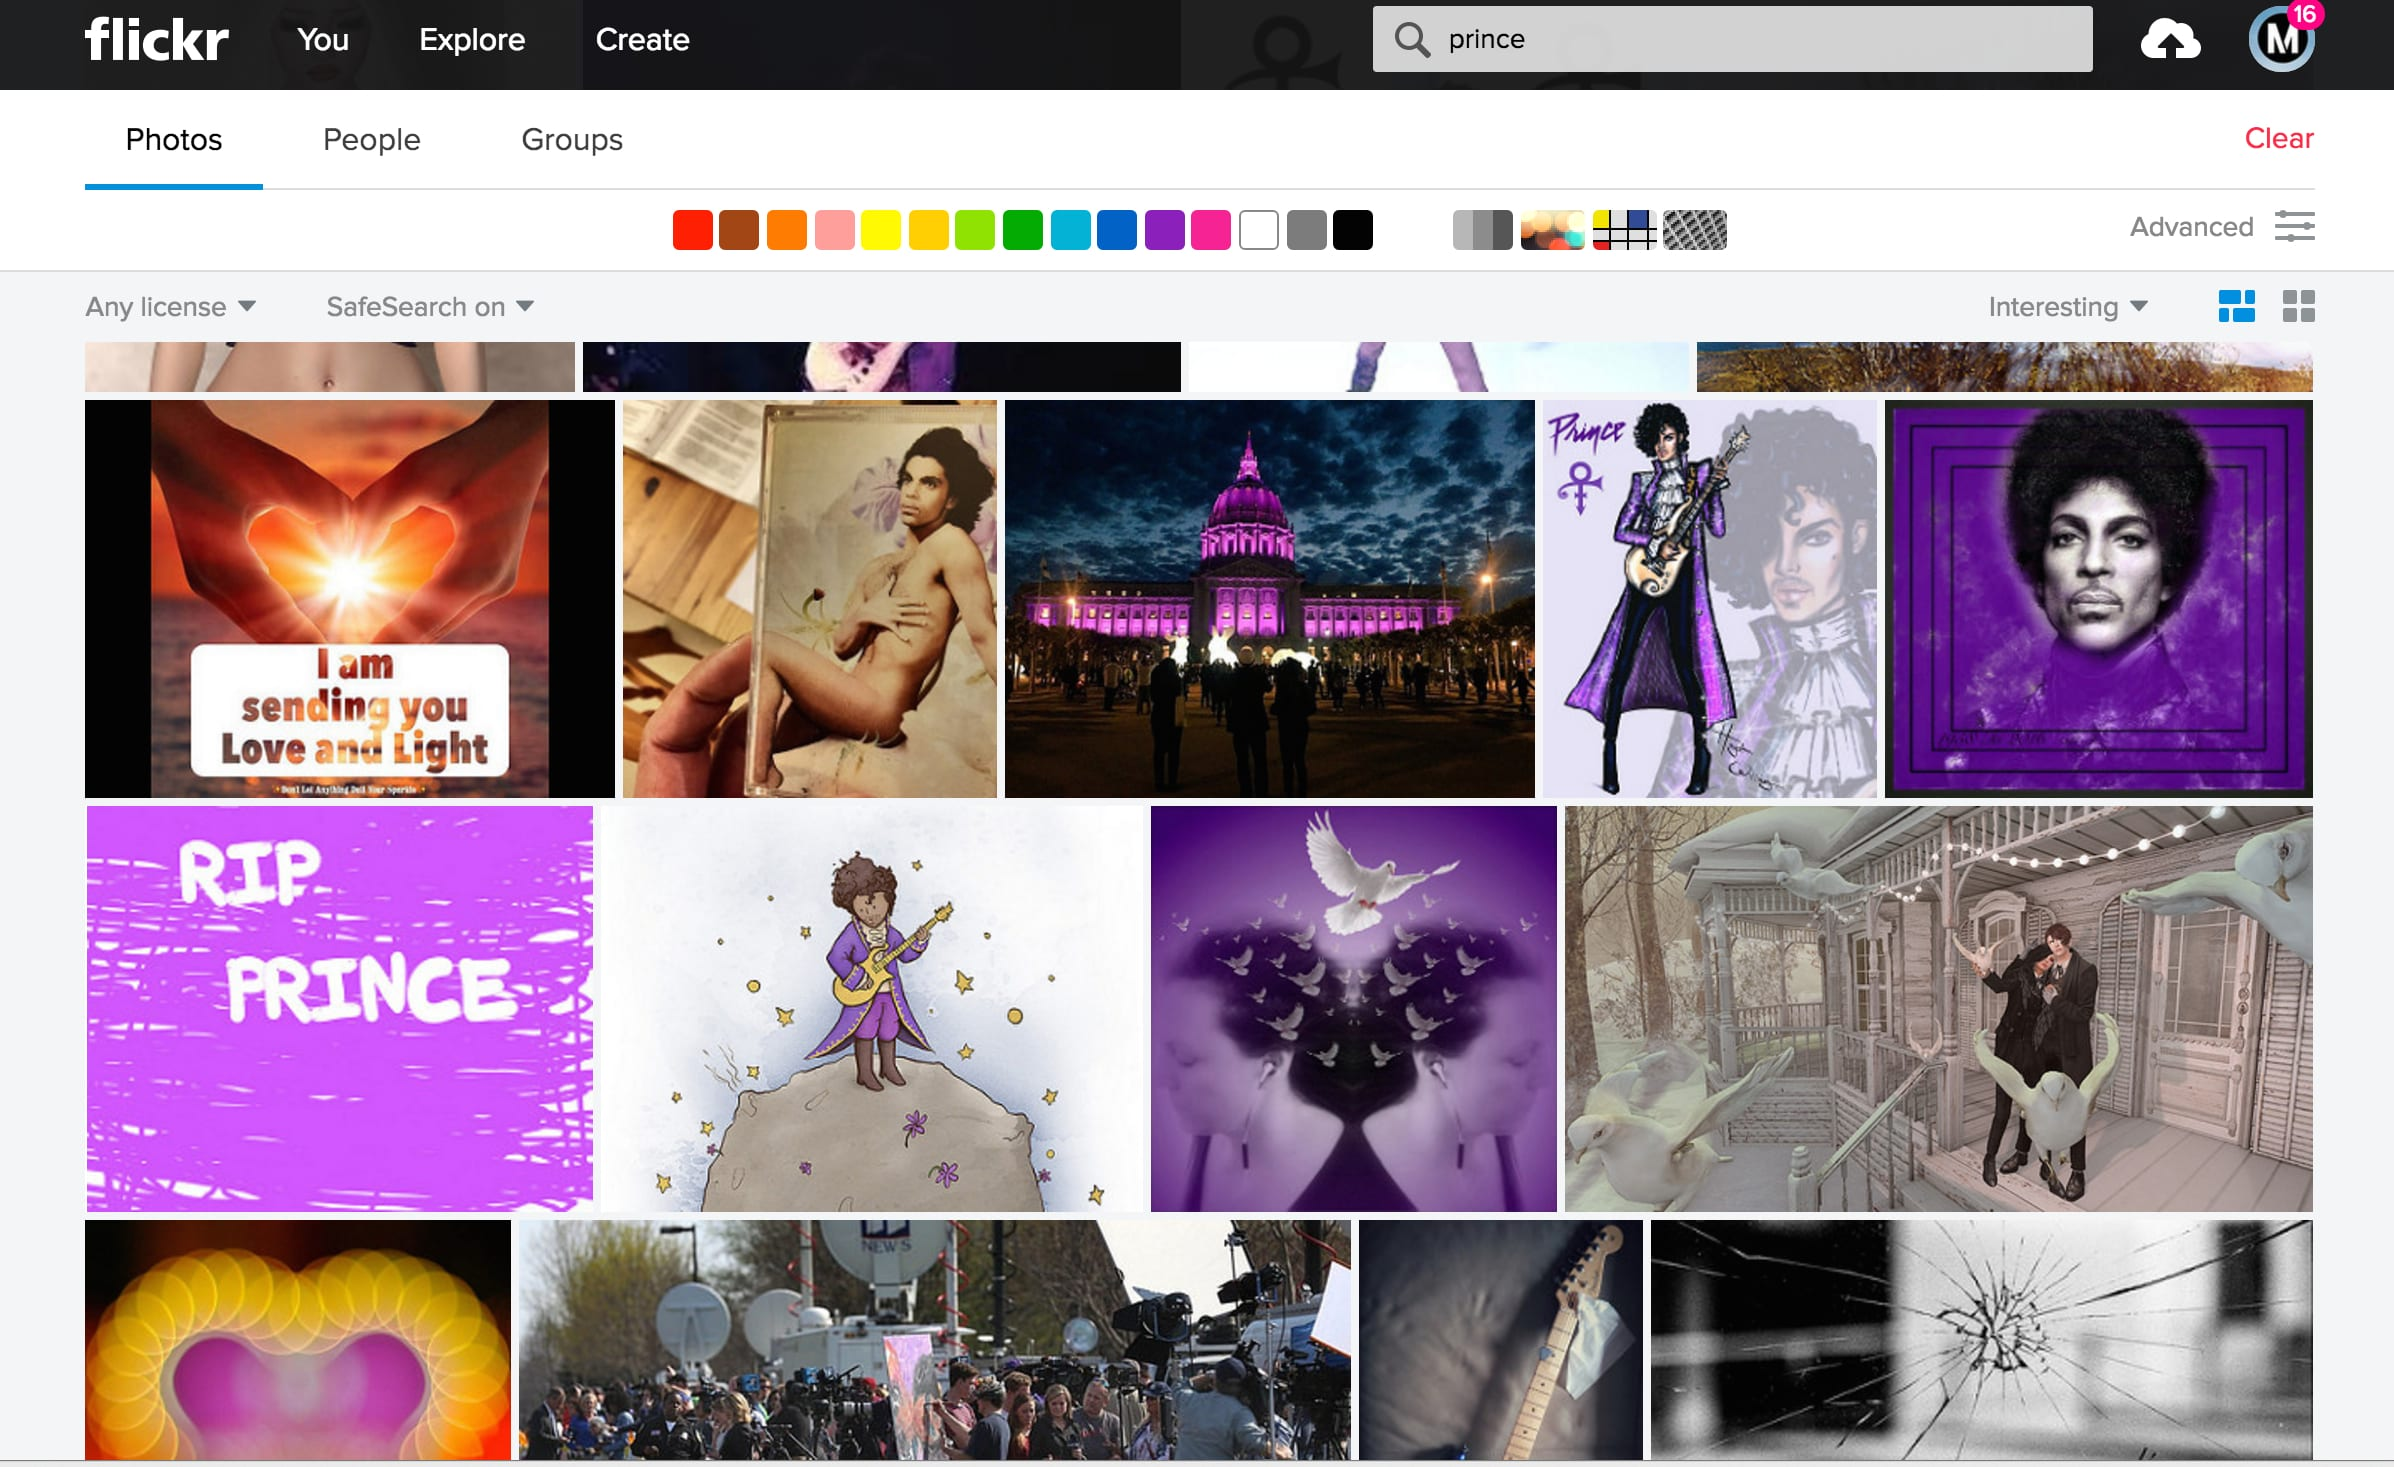 FlickrTribute